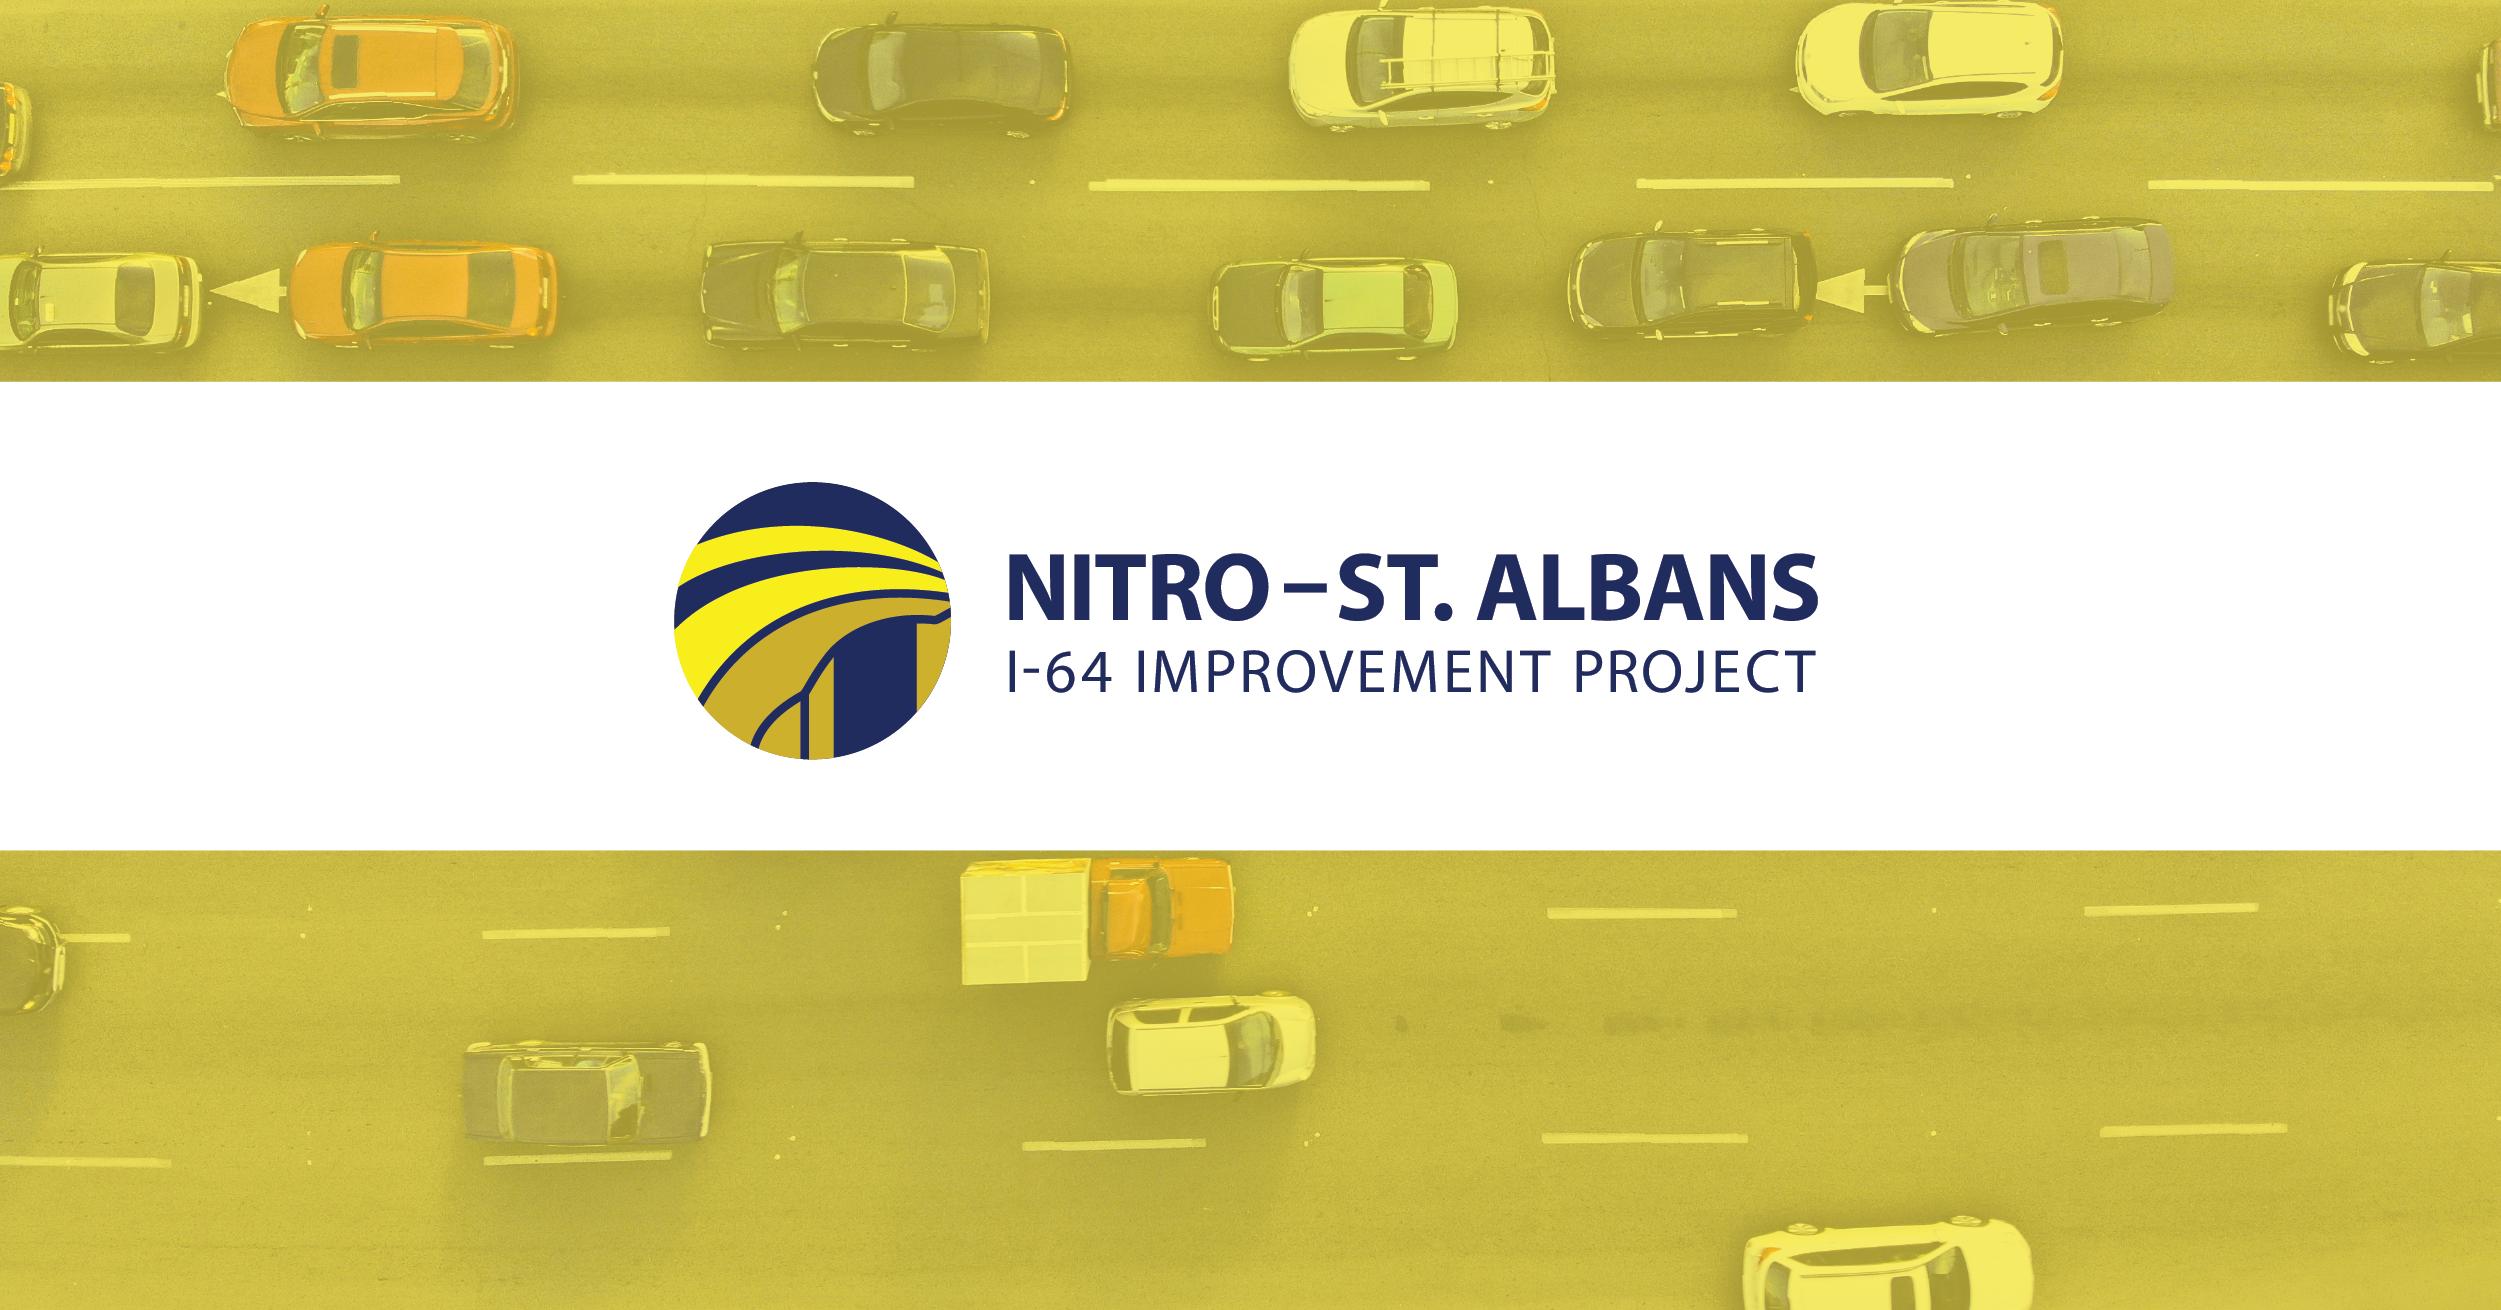 Nitro I-64 Improvement Project